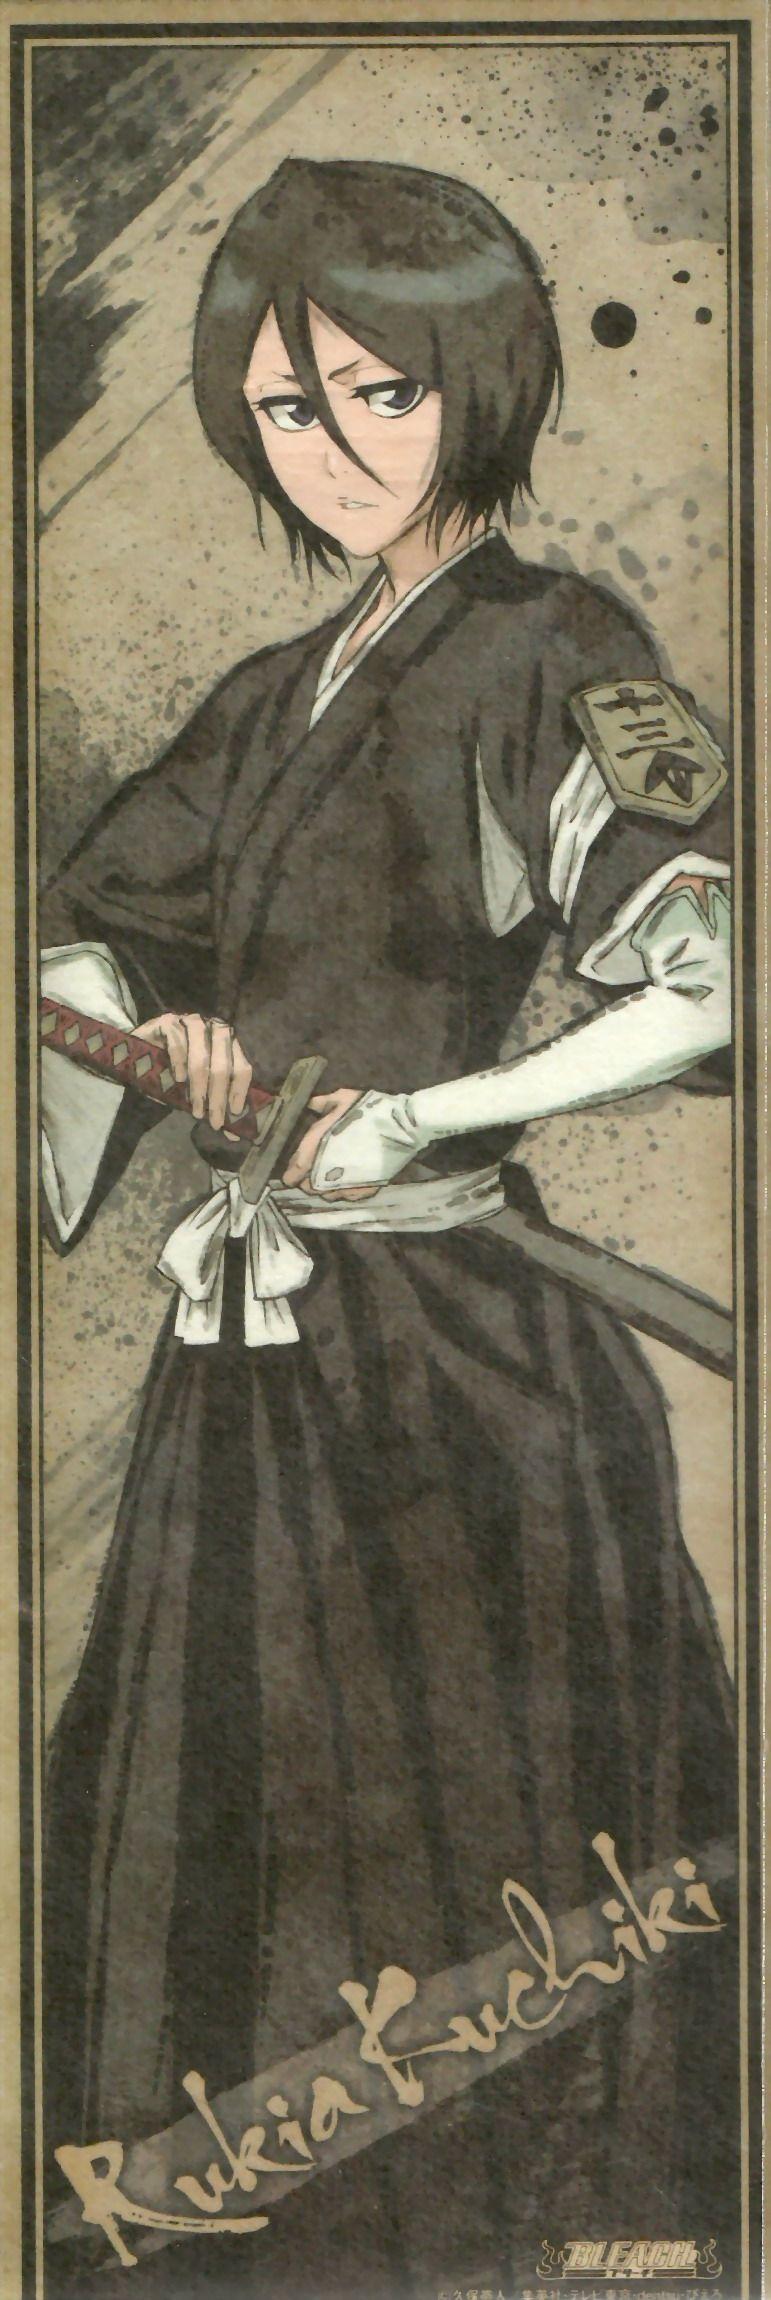 Kuchiki Rukia (Bleach)[ Swordnarmory.com ] #anime #manga #swords